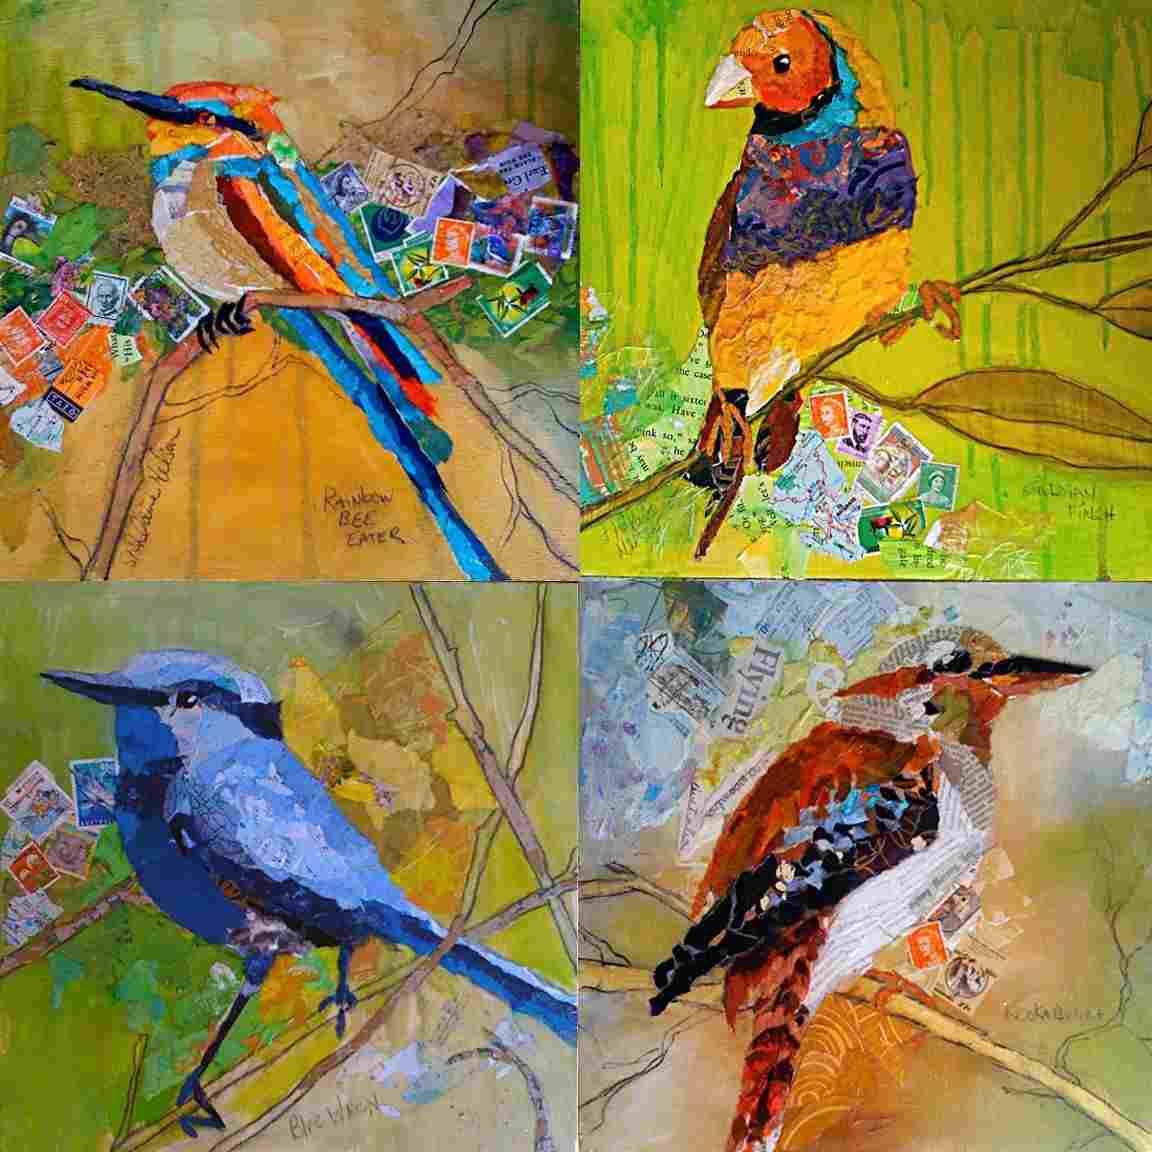 collage painting - Collage Painting C09 12 01 - Collage Painting